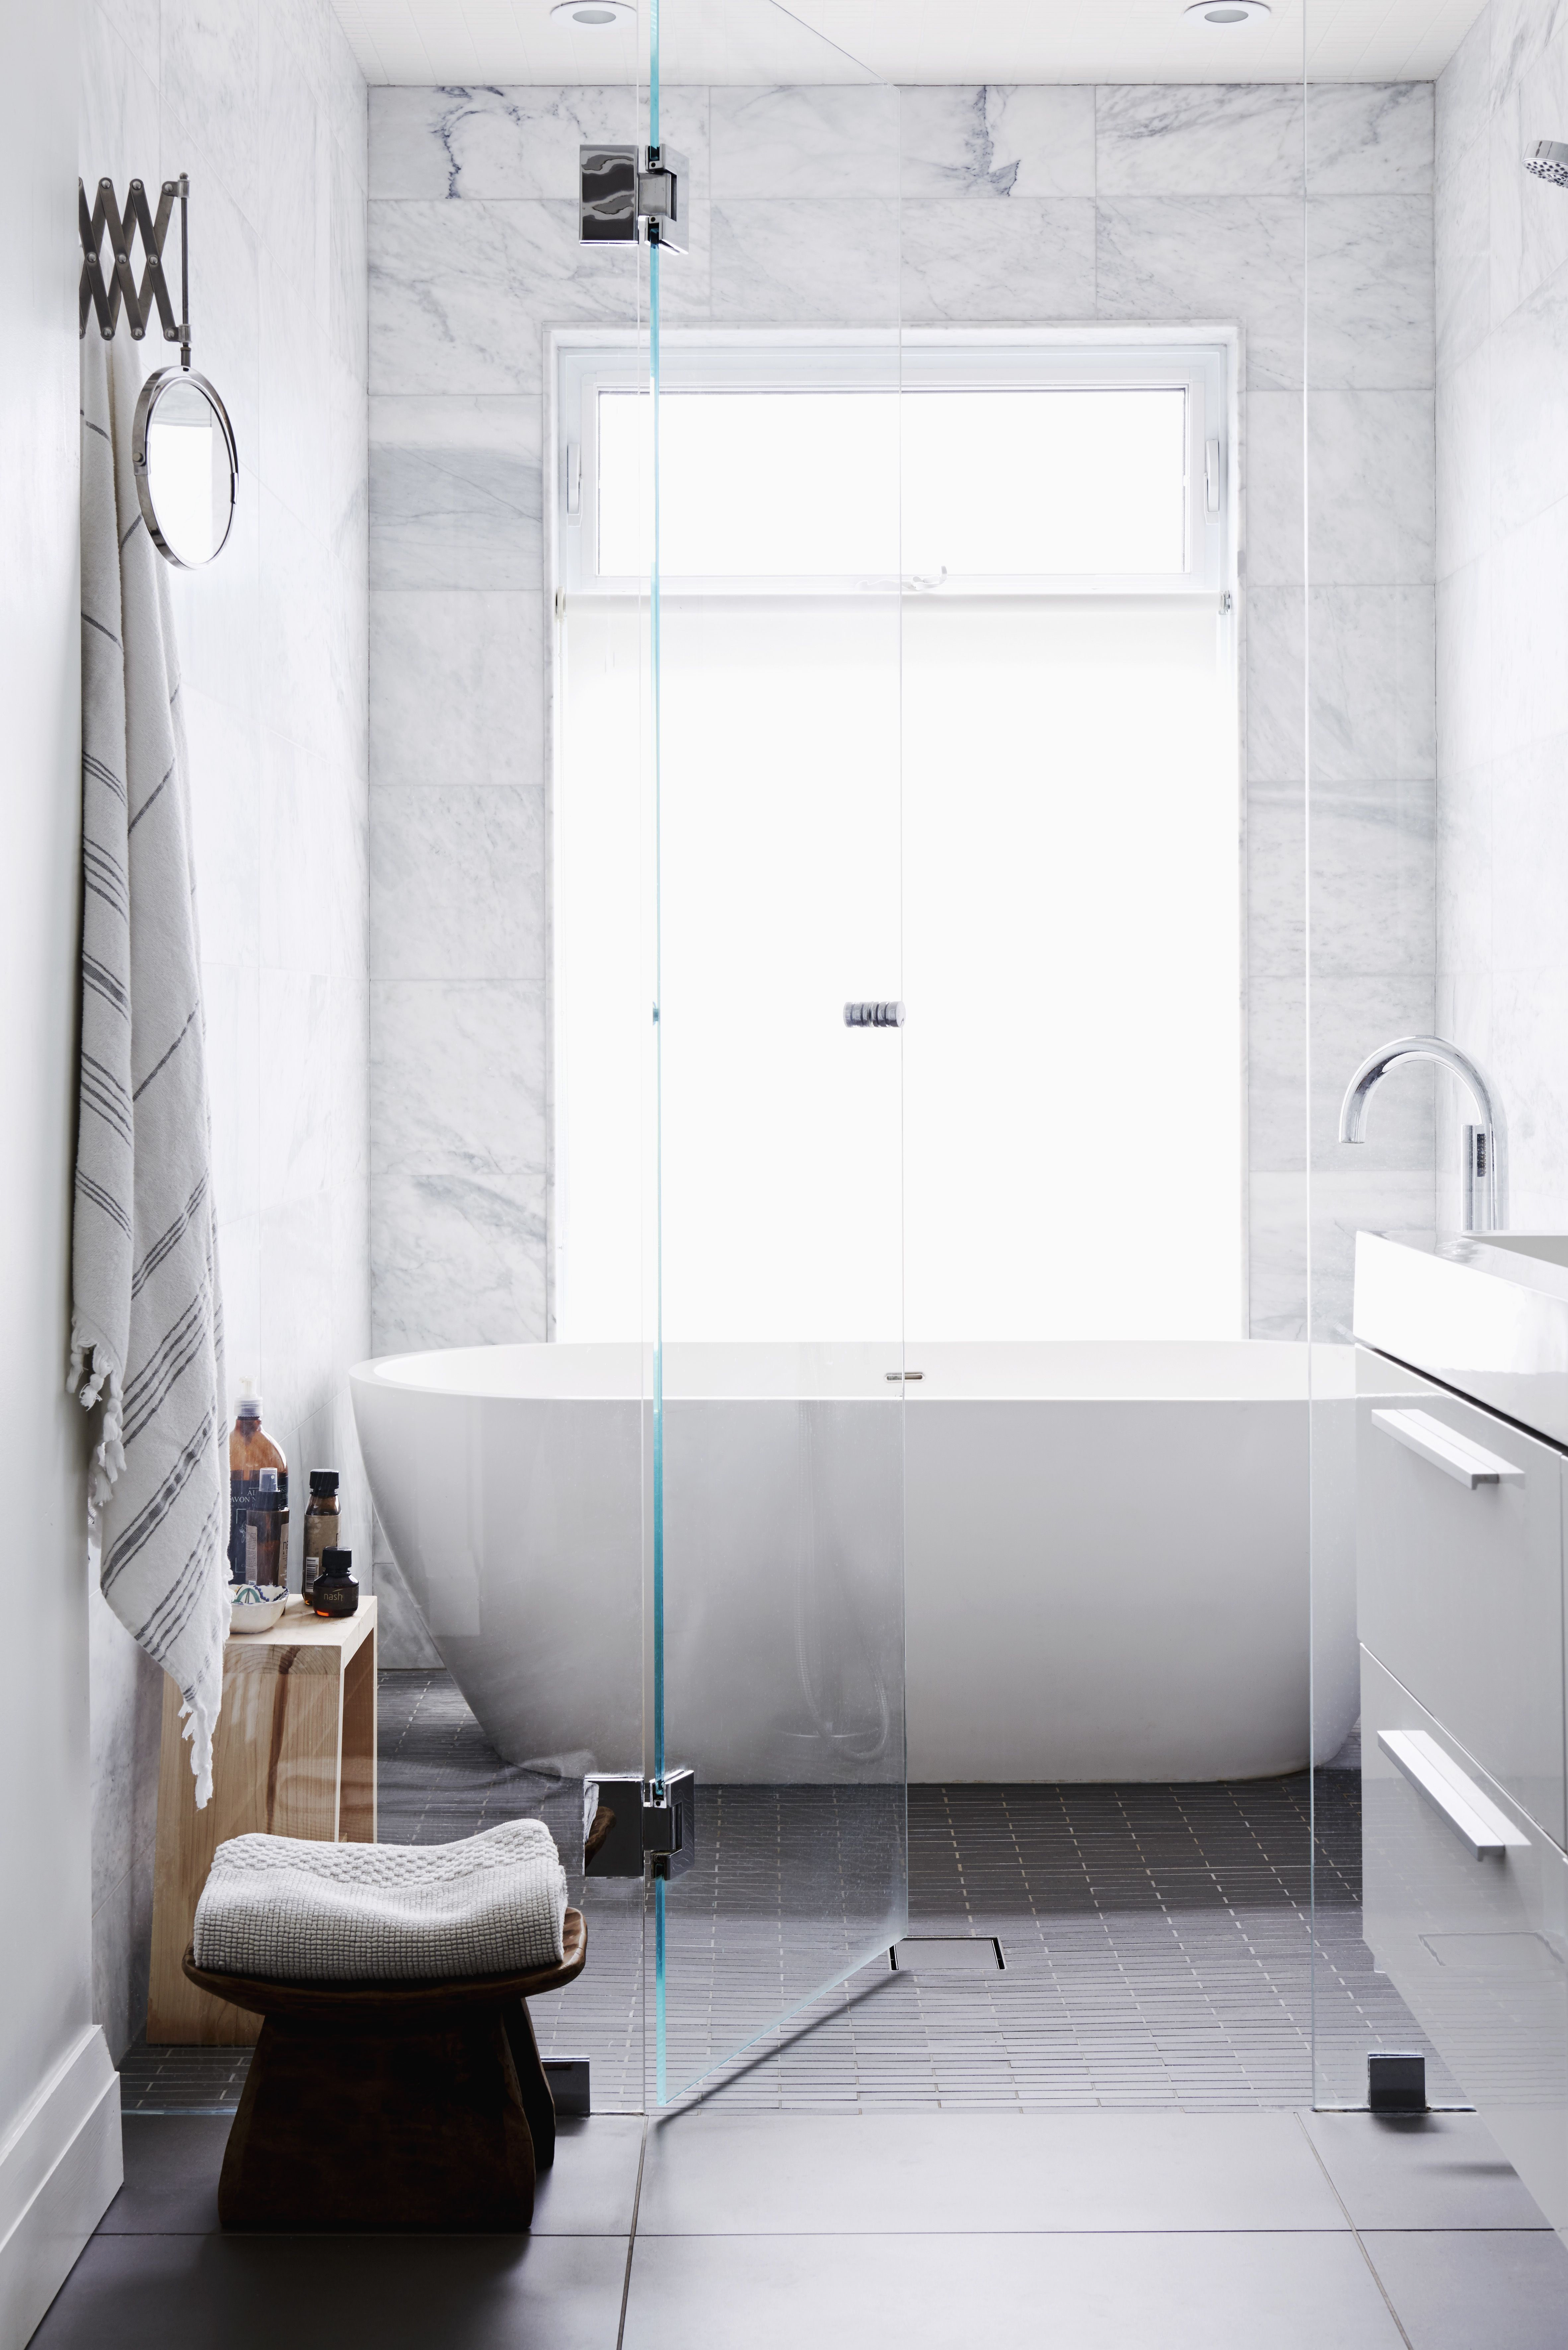 Best Photos from Family Bathroom Renovation | Pinterest | Vanity ...